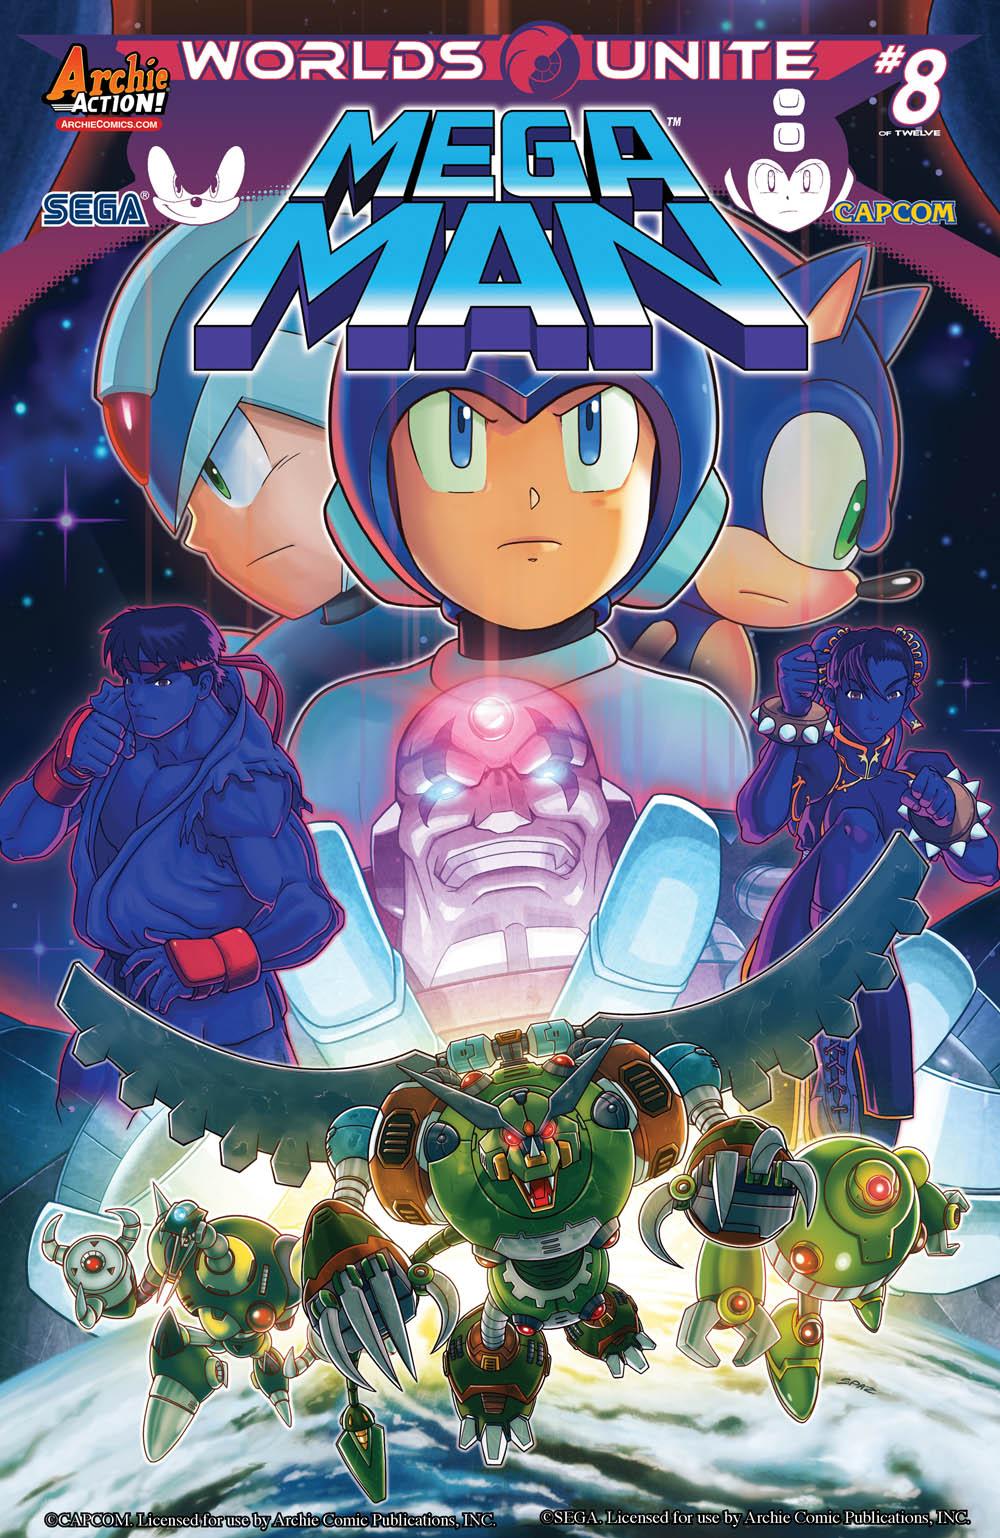 Mega man issue 51 archie comics mmkb fandom powered - Megaman wikia ...